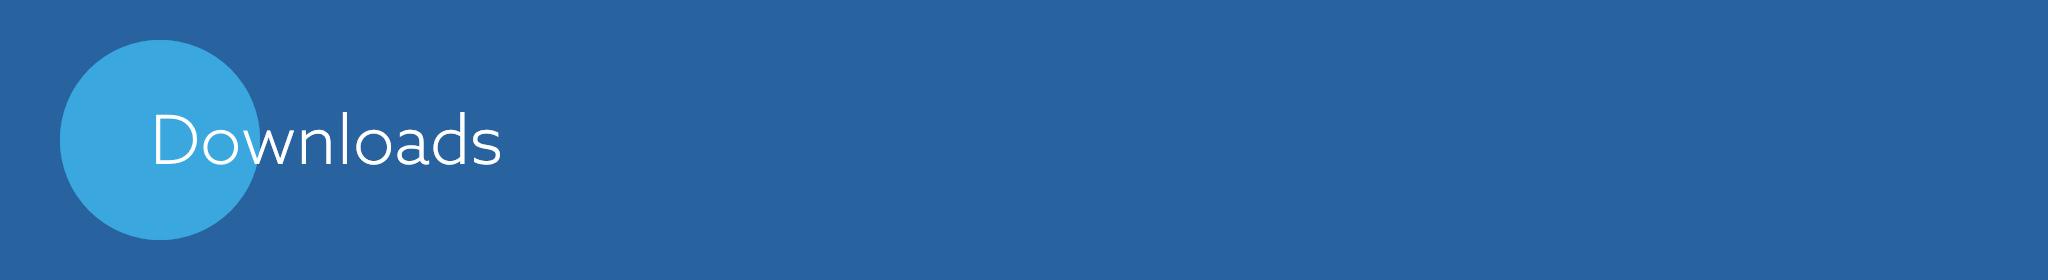 Technical Desktop Banner